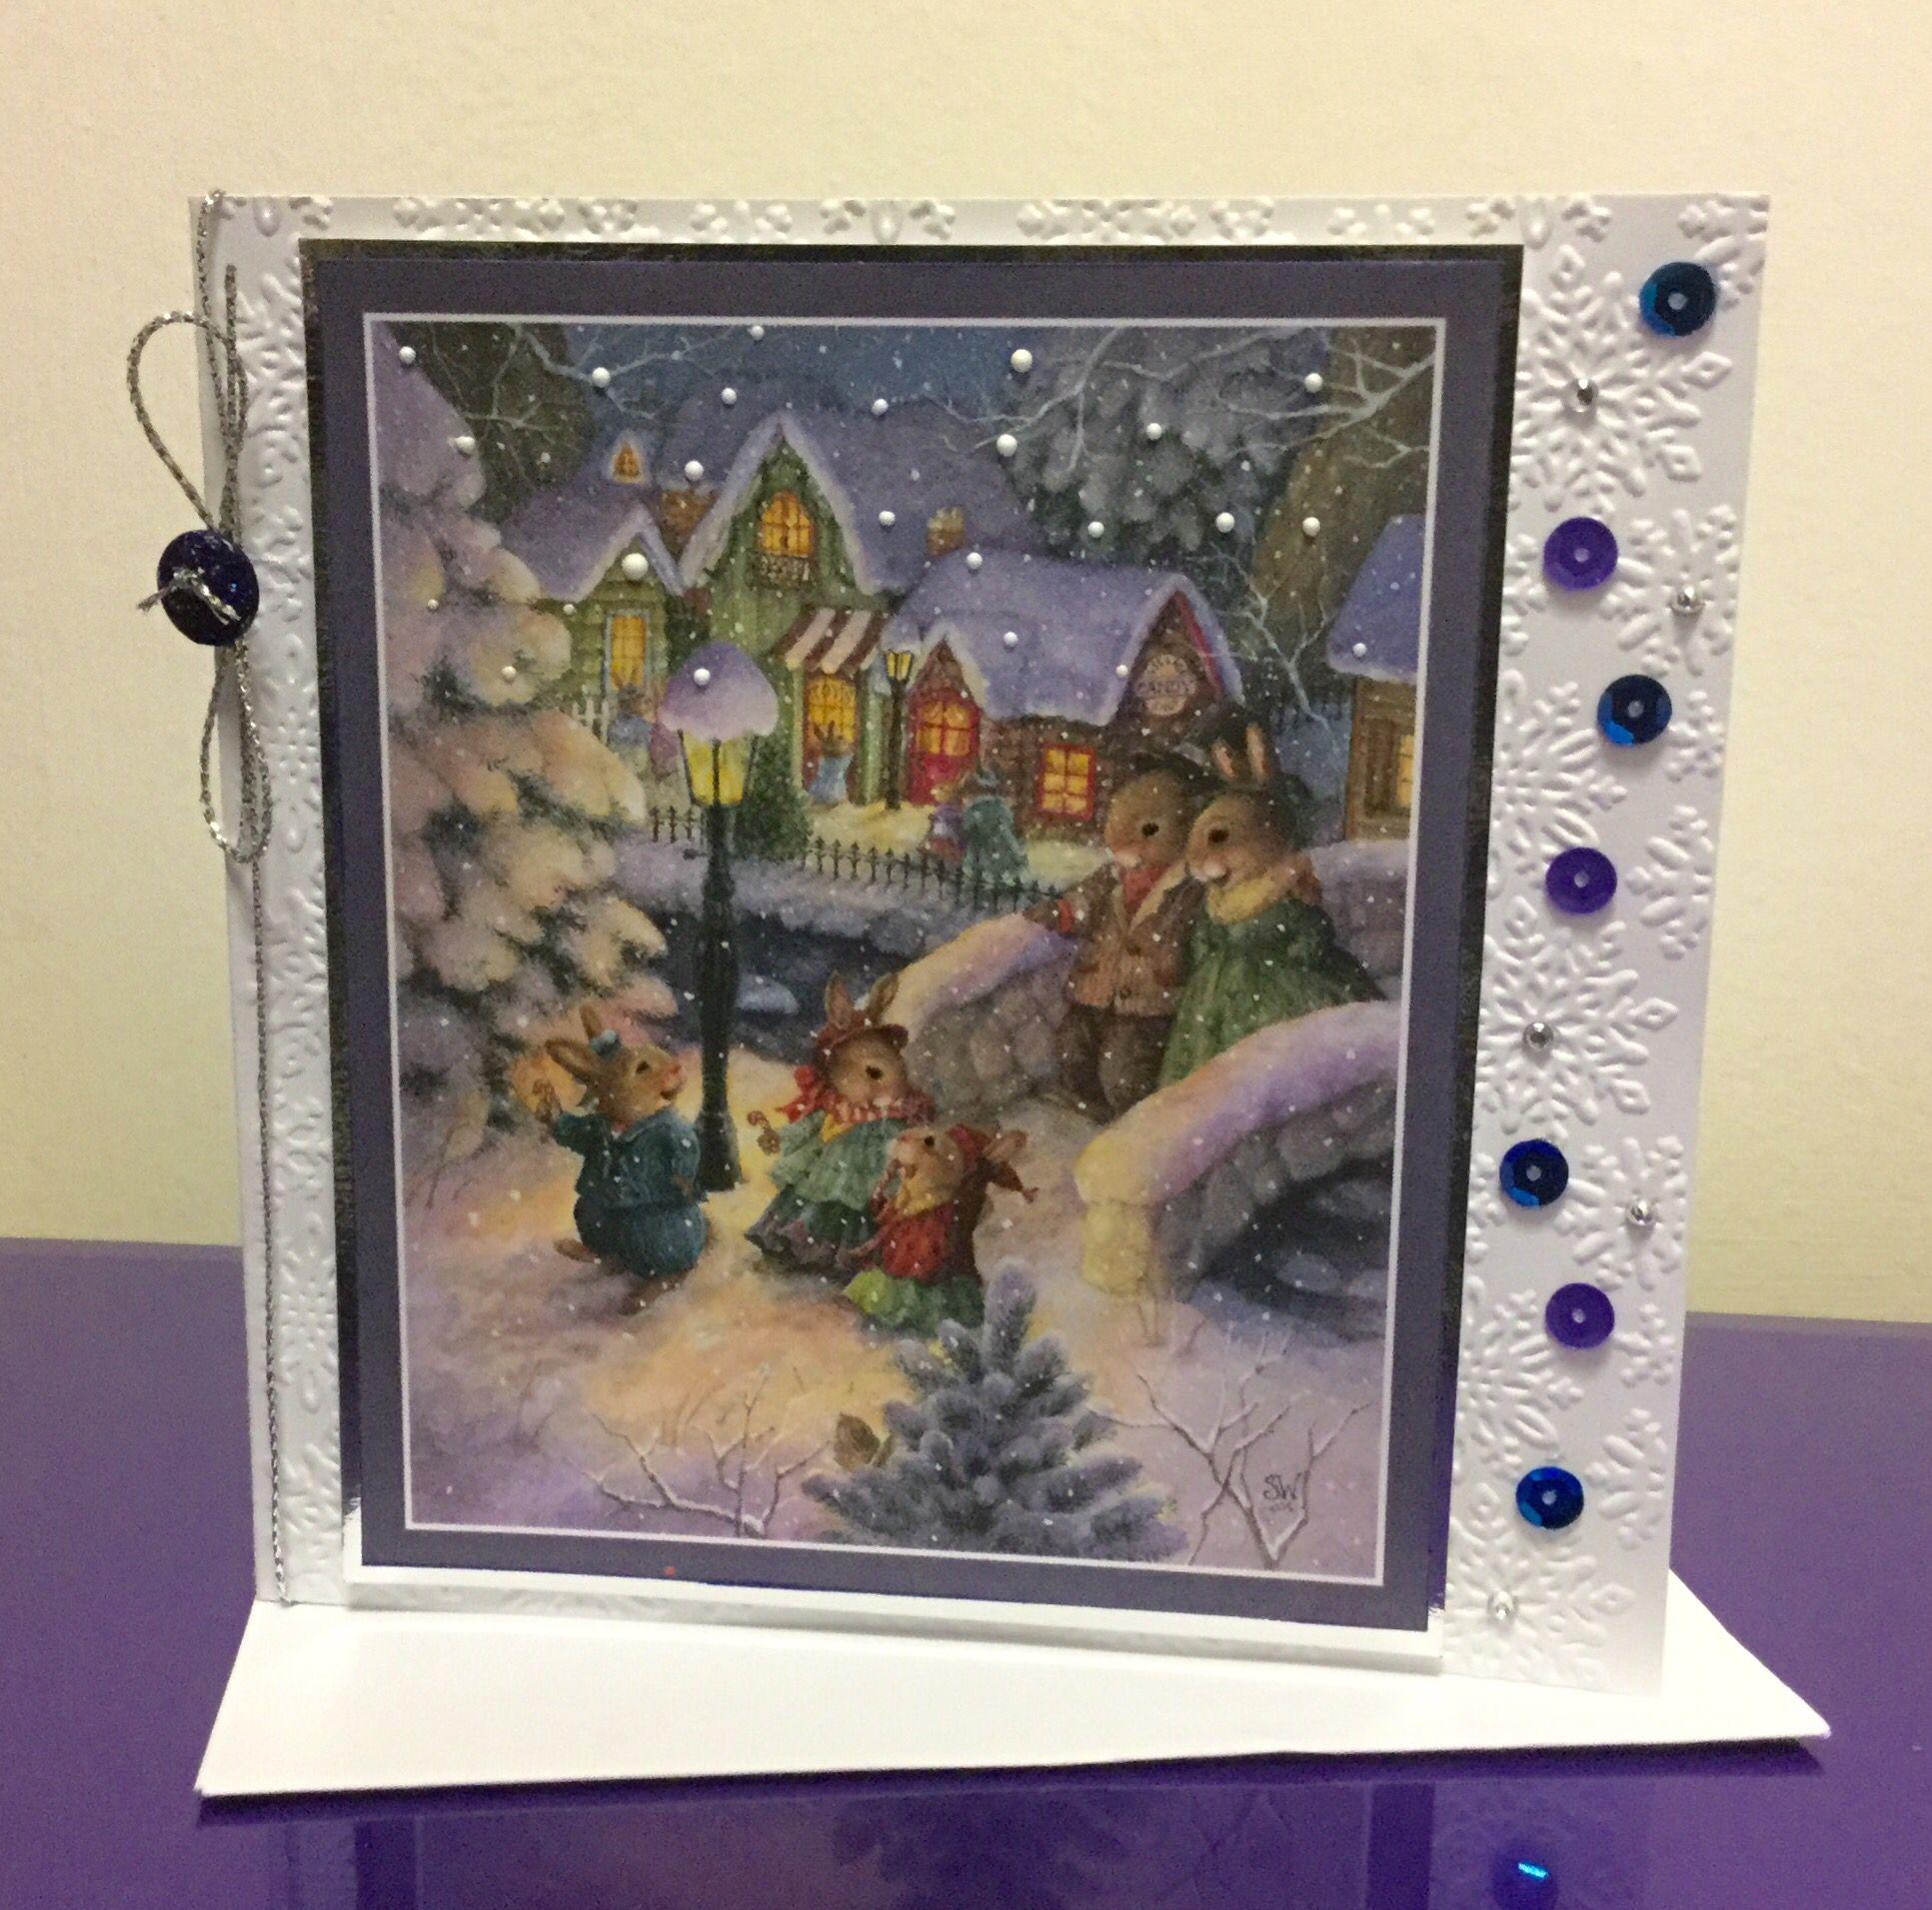 Holly Pond Hill Joanna Sheen Mittens Pinterest Christmas